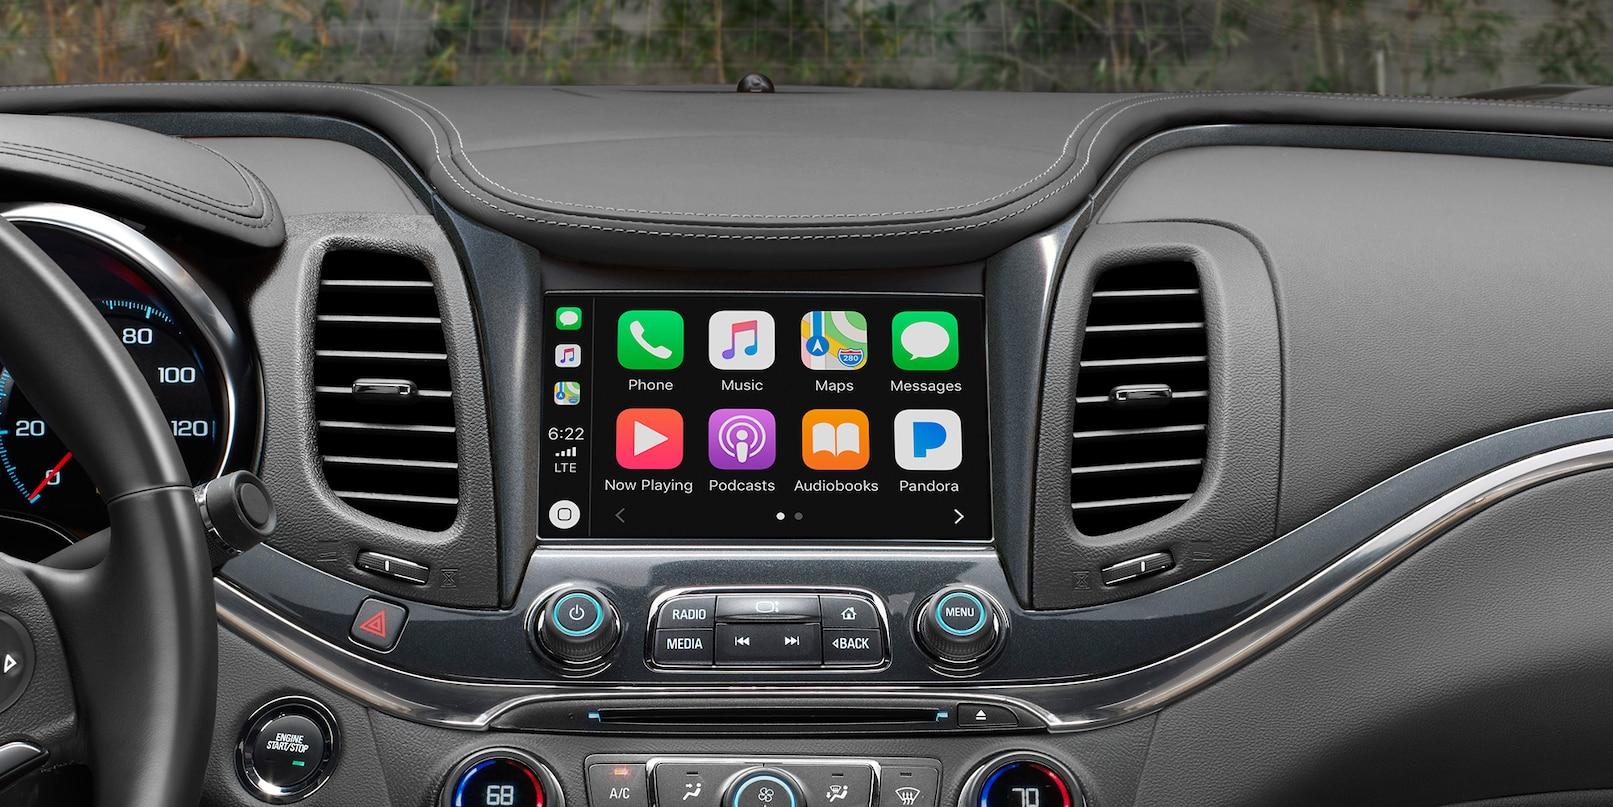 2019 Chevrolet Impala Center Console